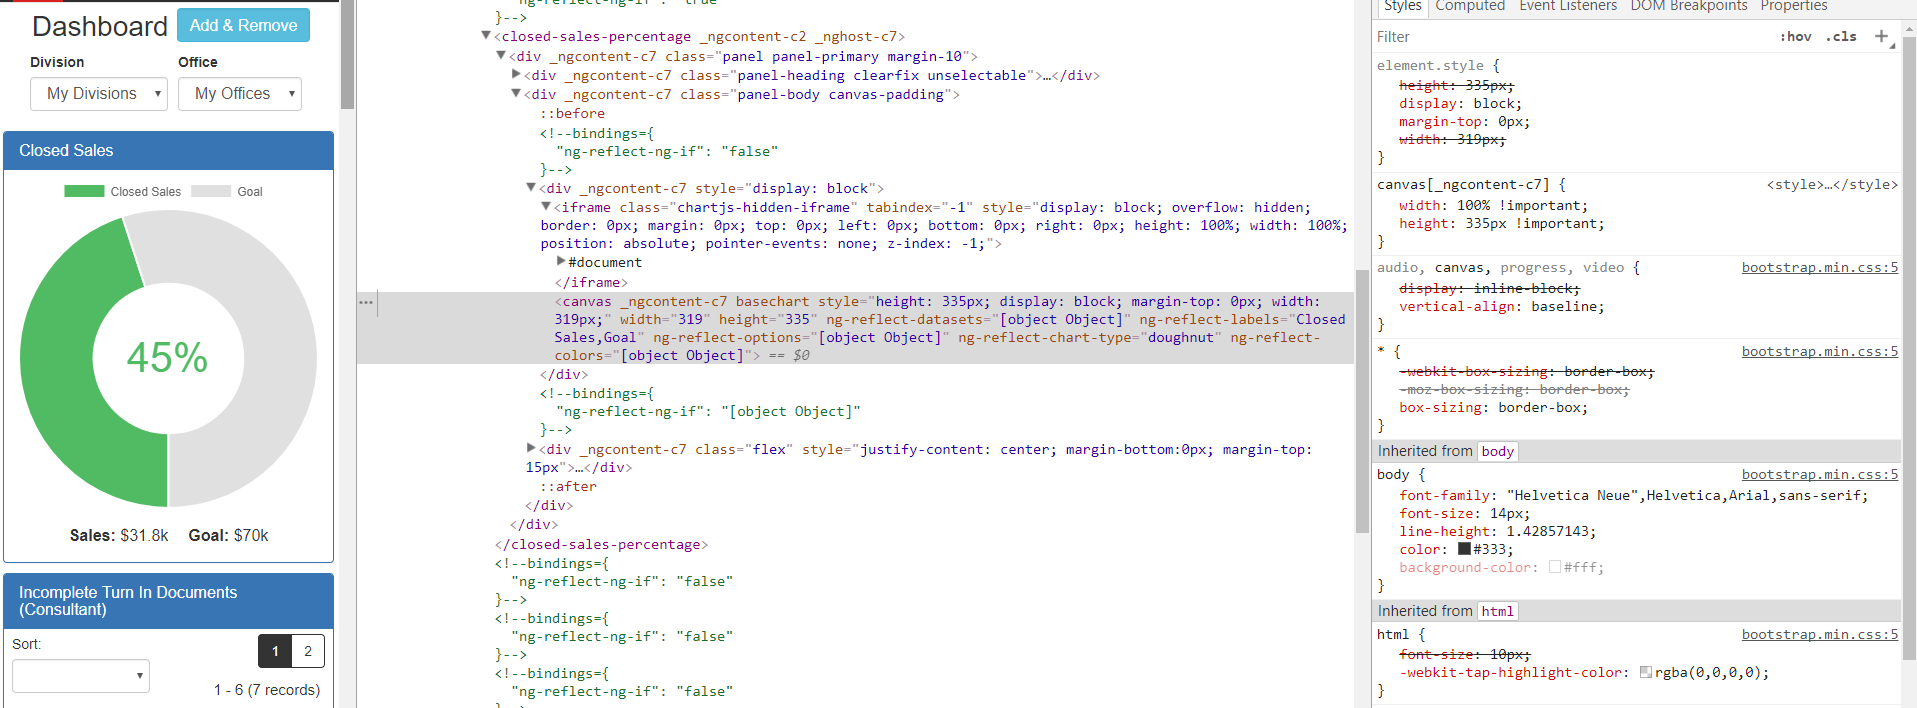 Doughnut chart not showing up after AOT? (but filltext is working